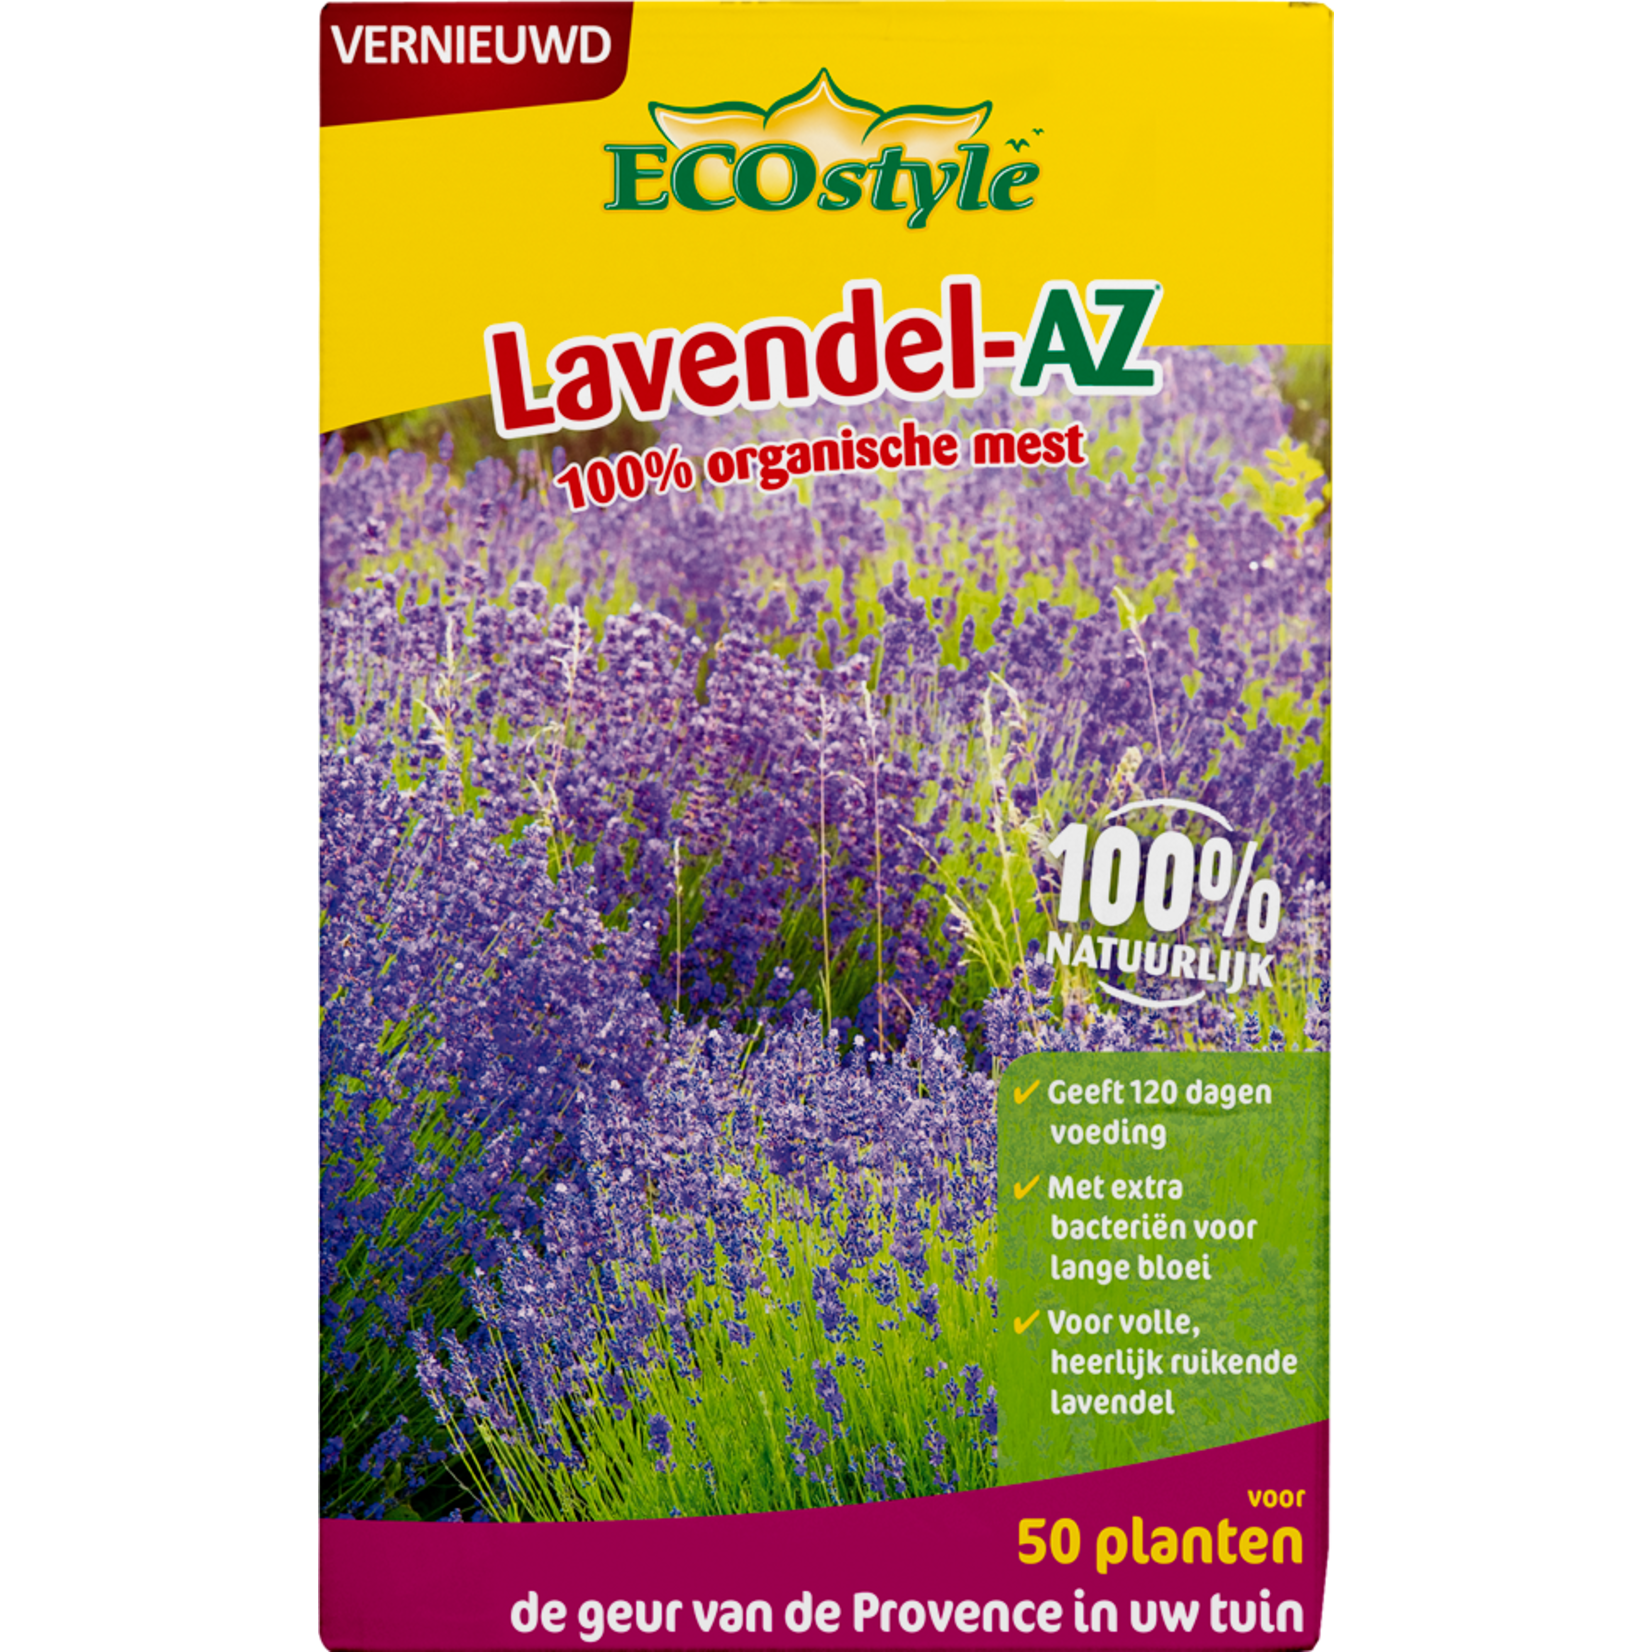 Ecostyle Lavendel-az 800 g